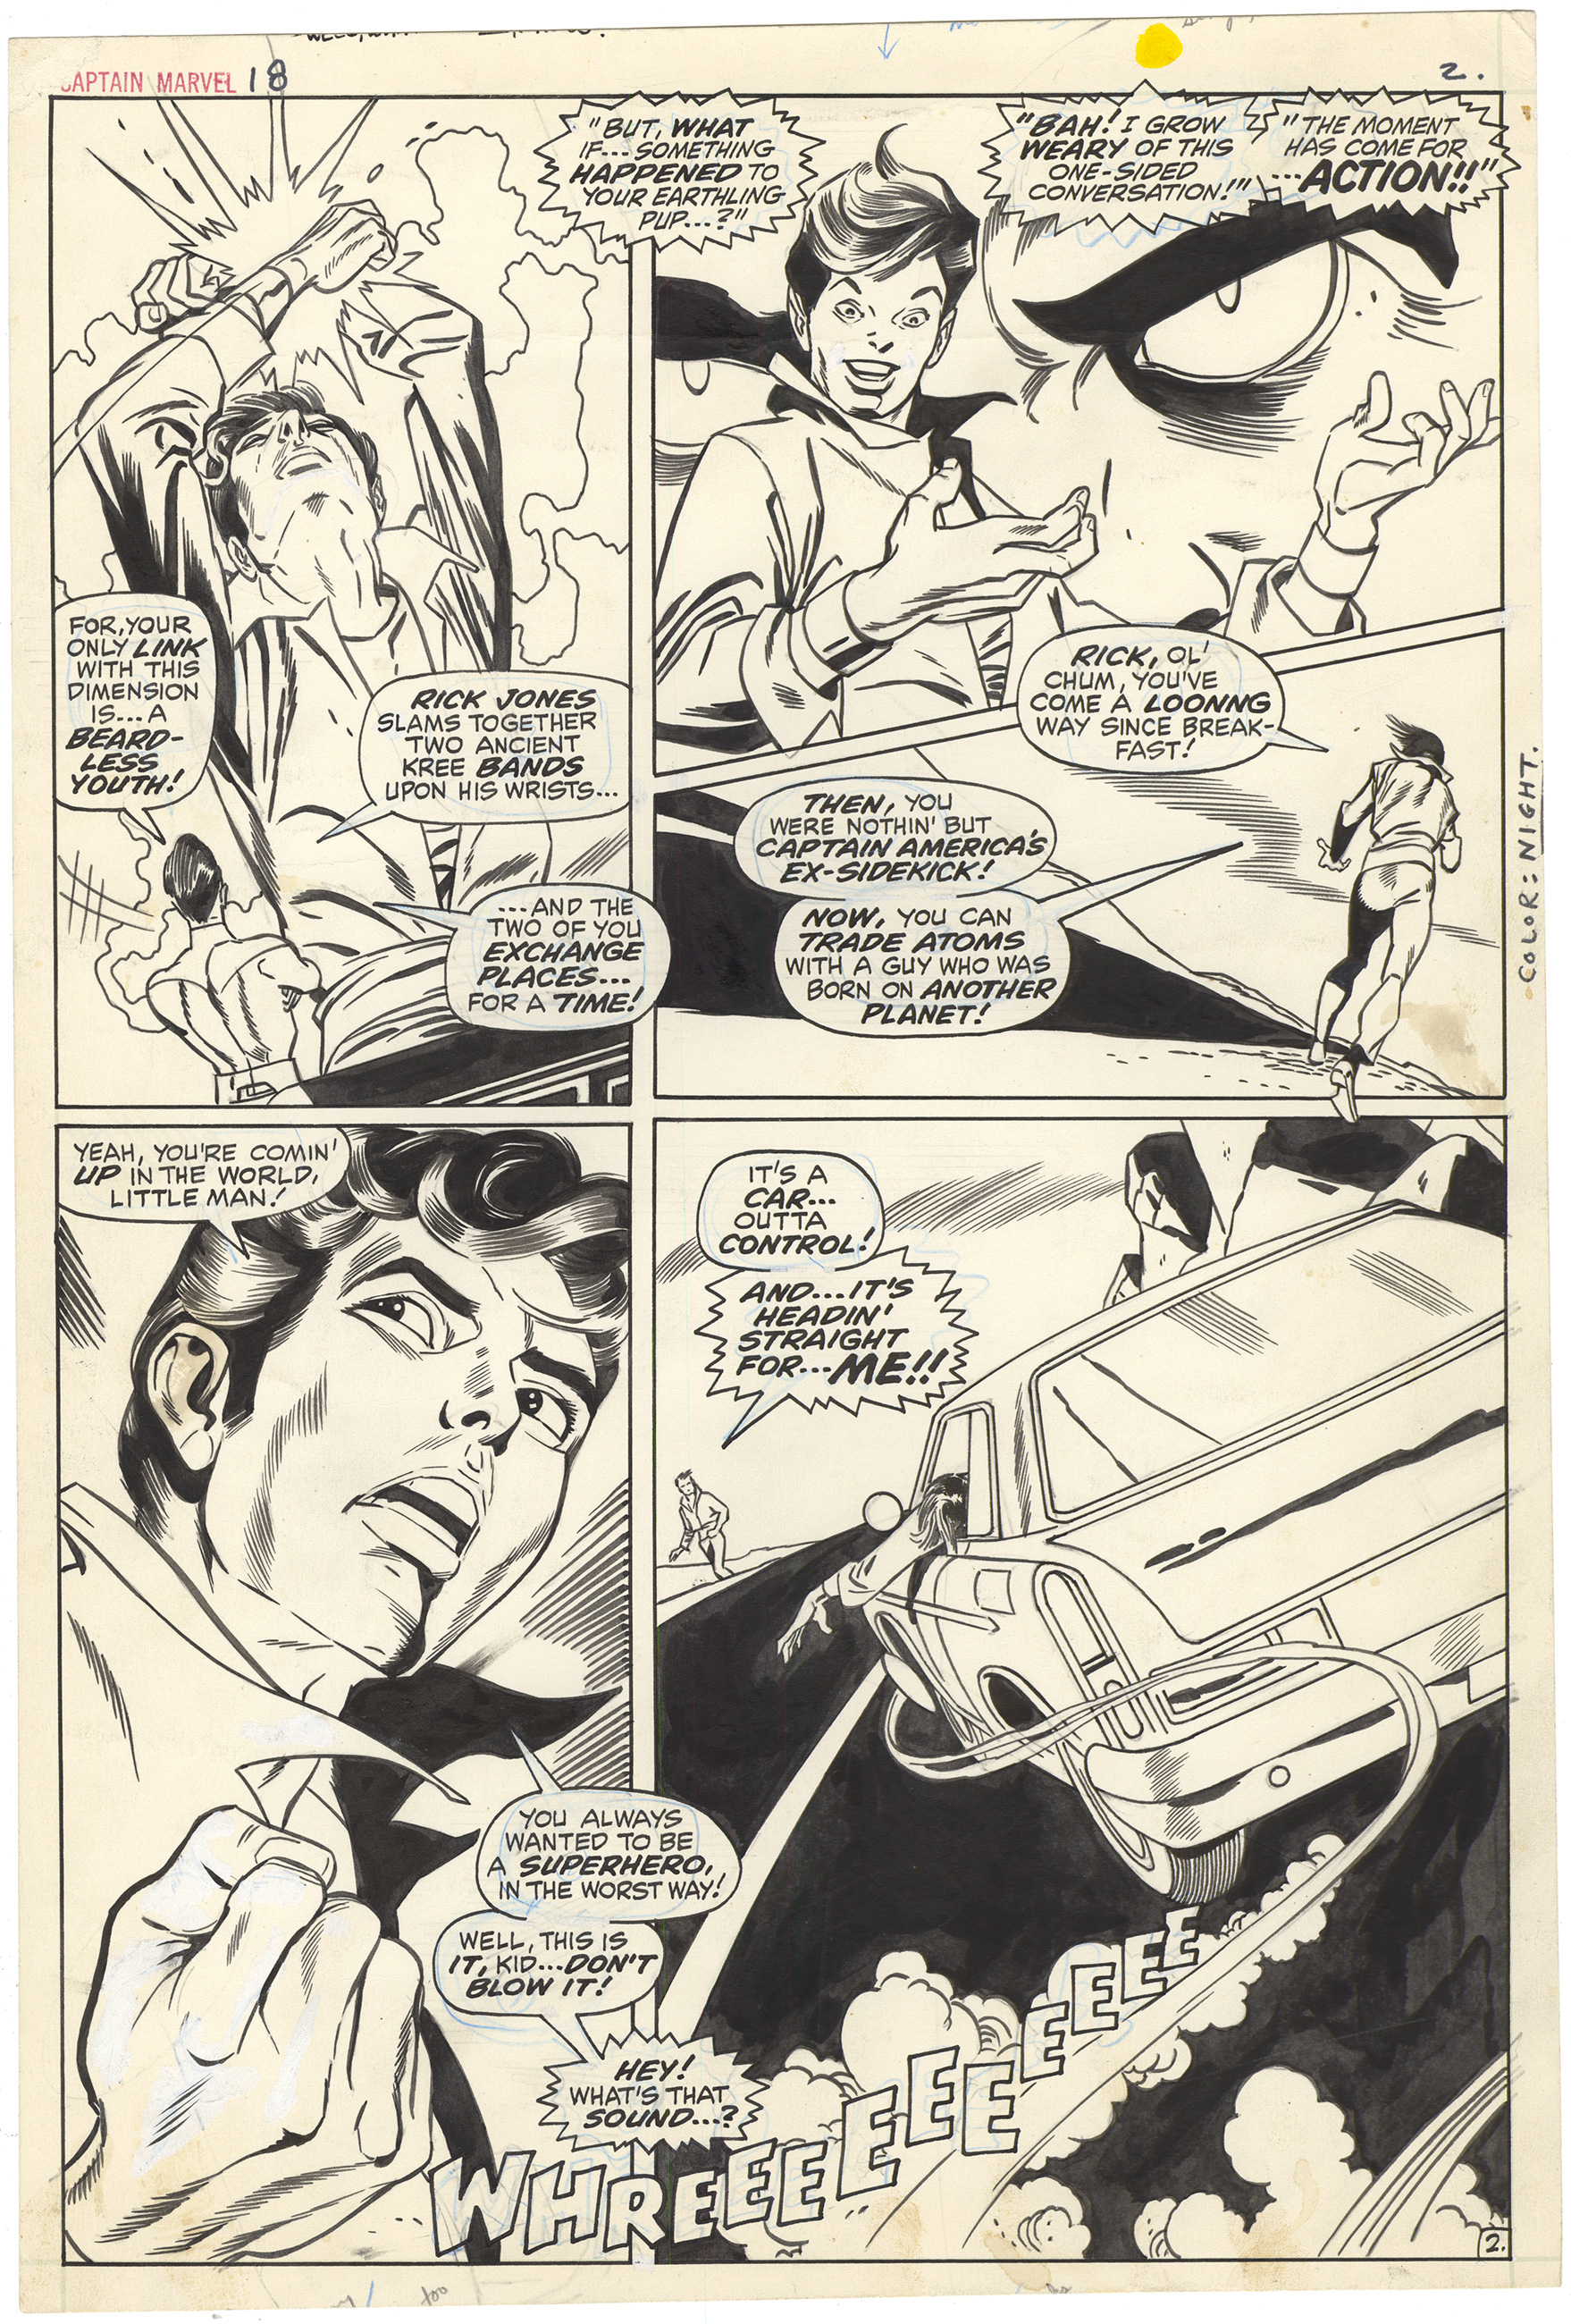 Captain Marvel #18 p2